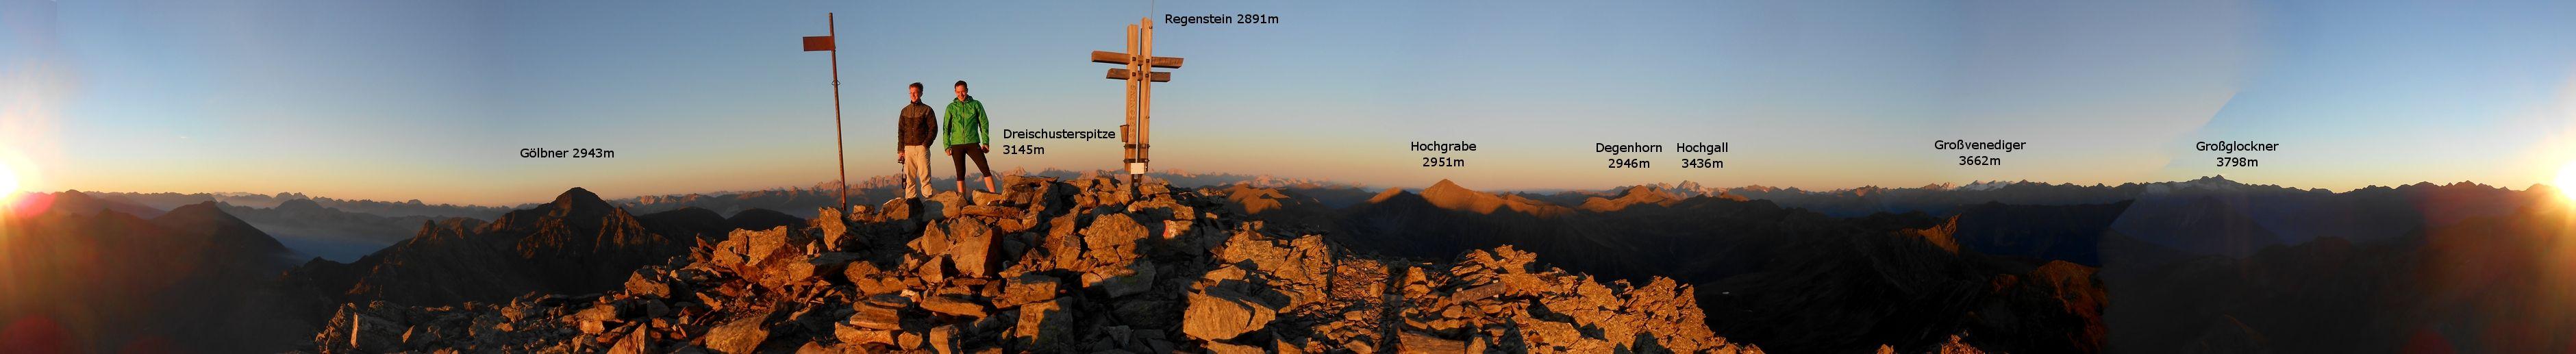 Panorama_Regenstein